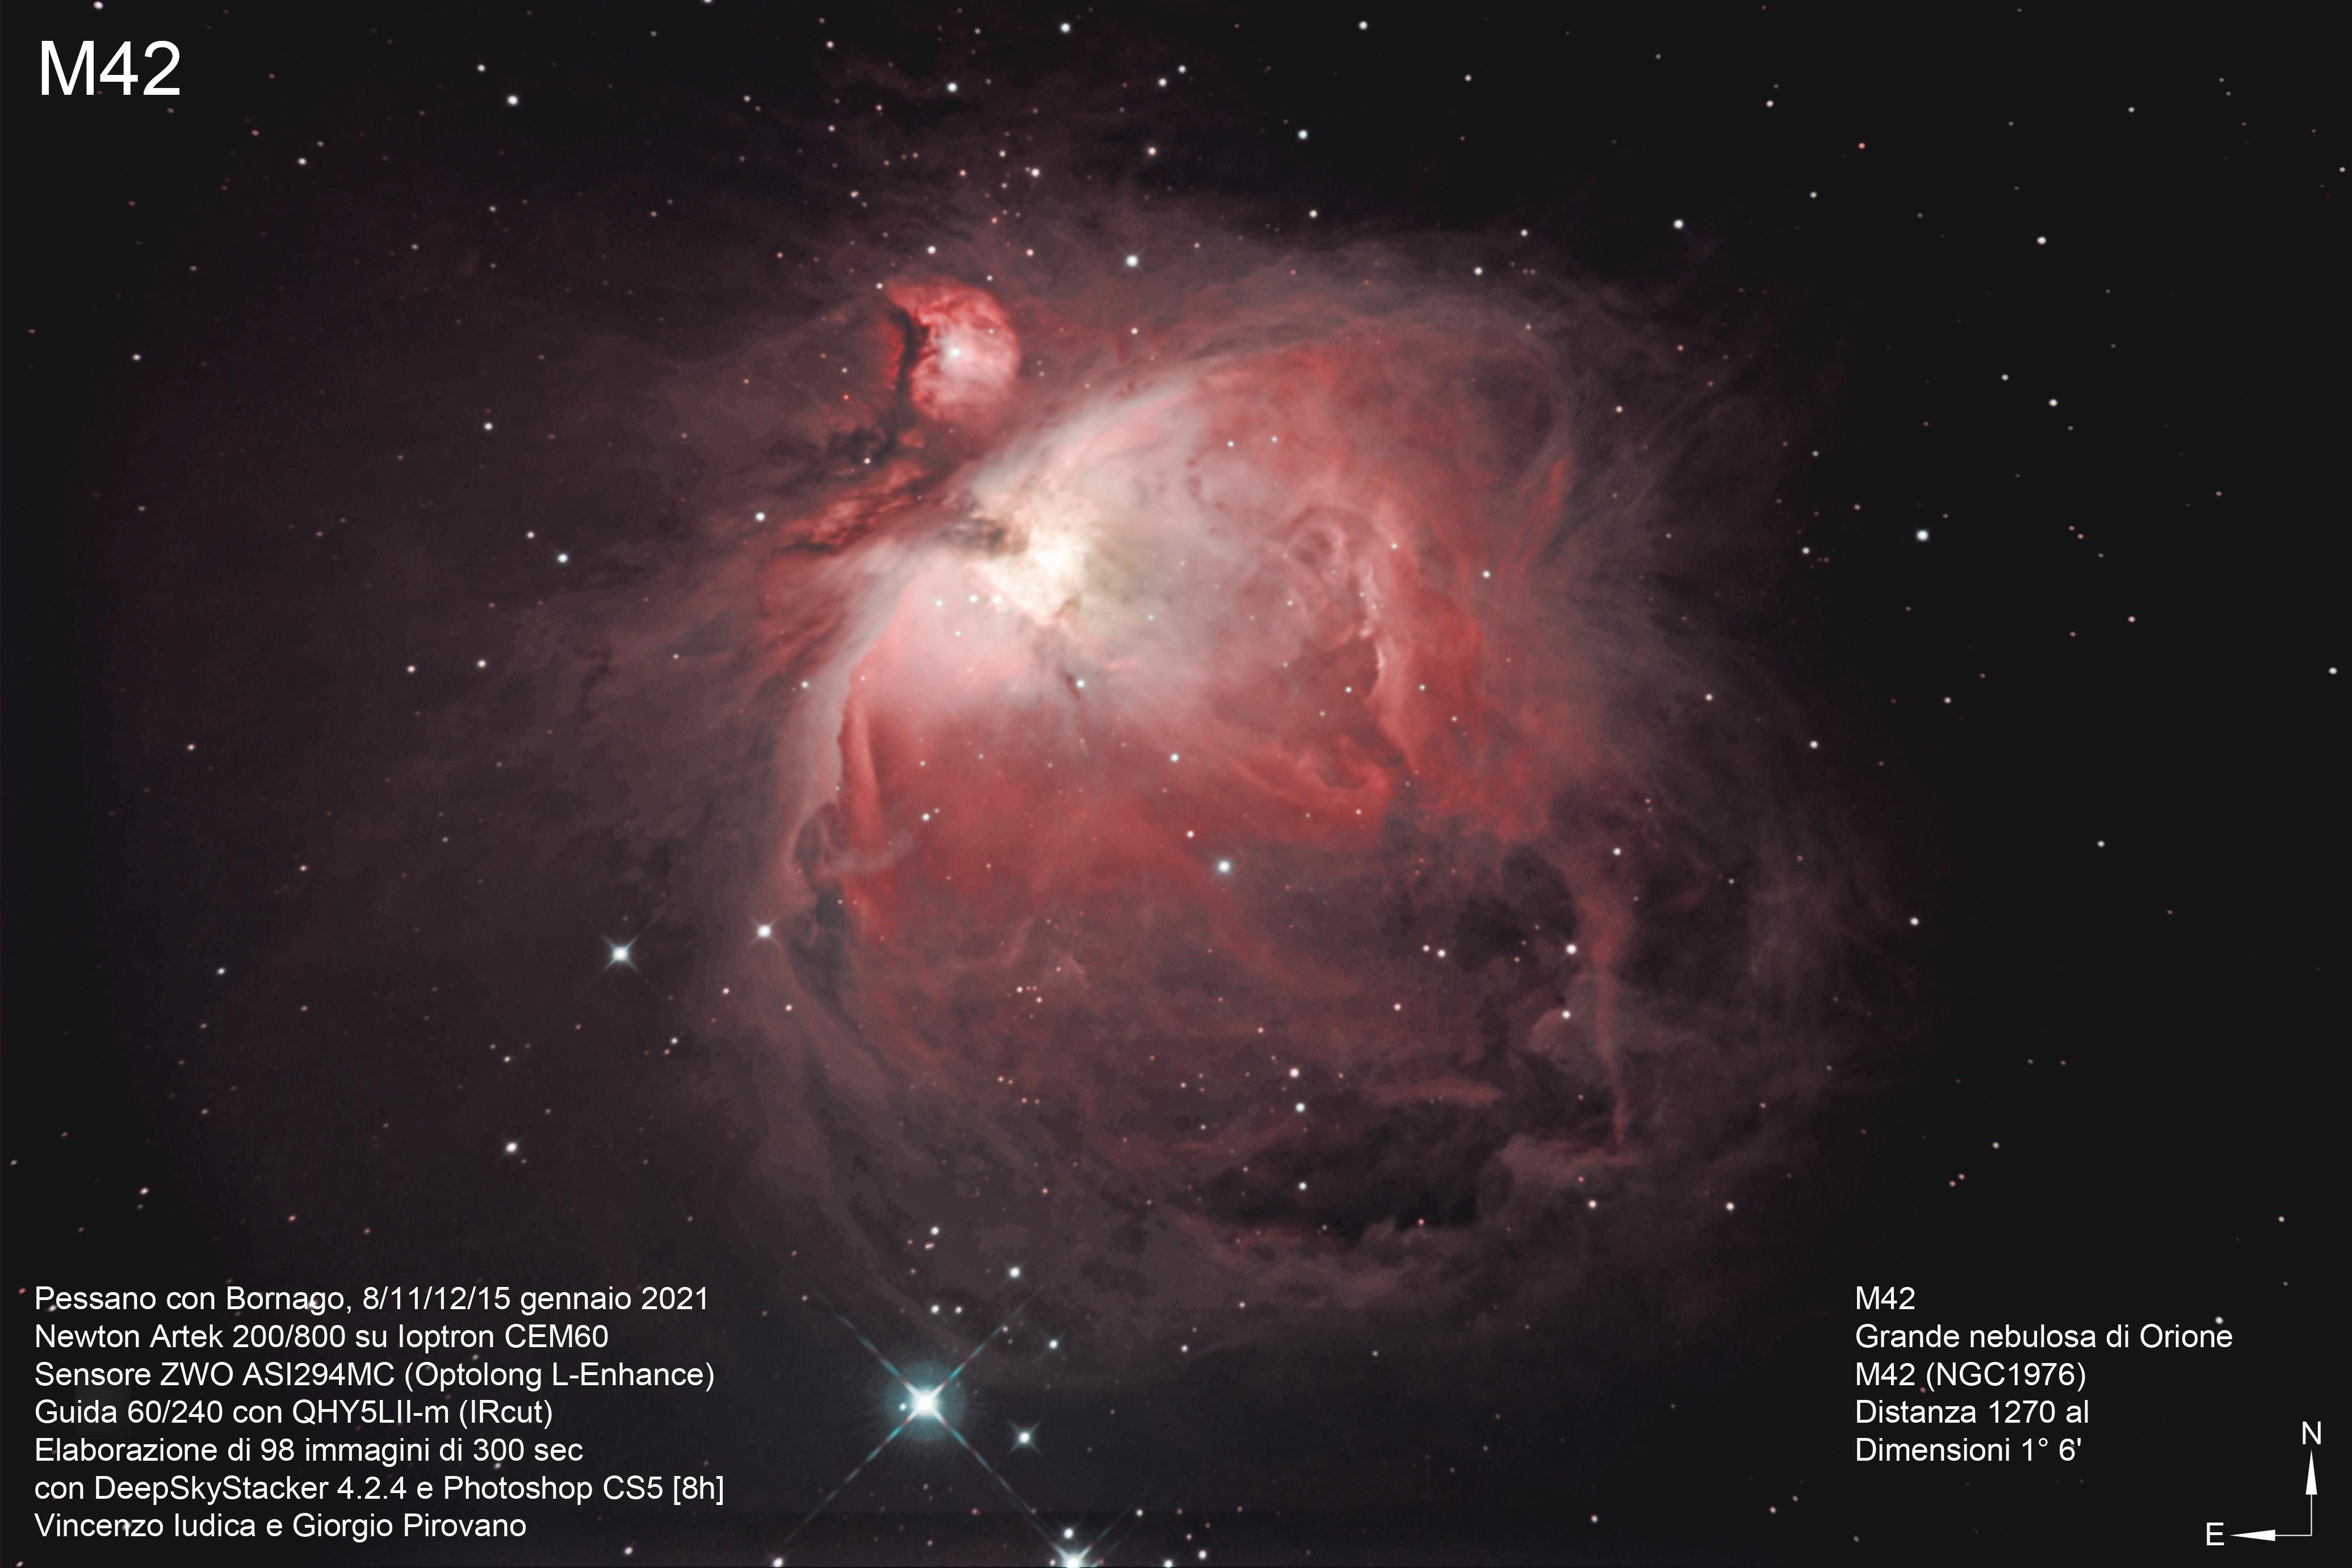 <p>Regione H II, nebulosa ad emissione/riflessione nella costellazione di Orione.</p>